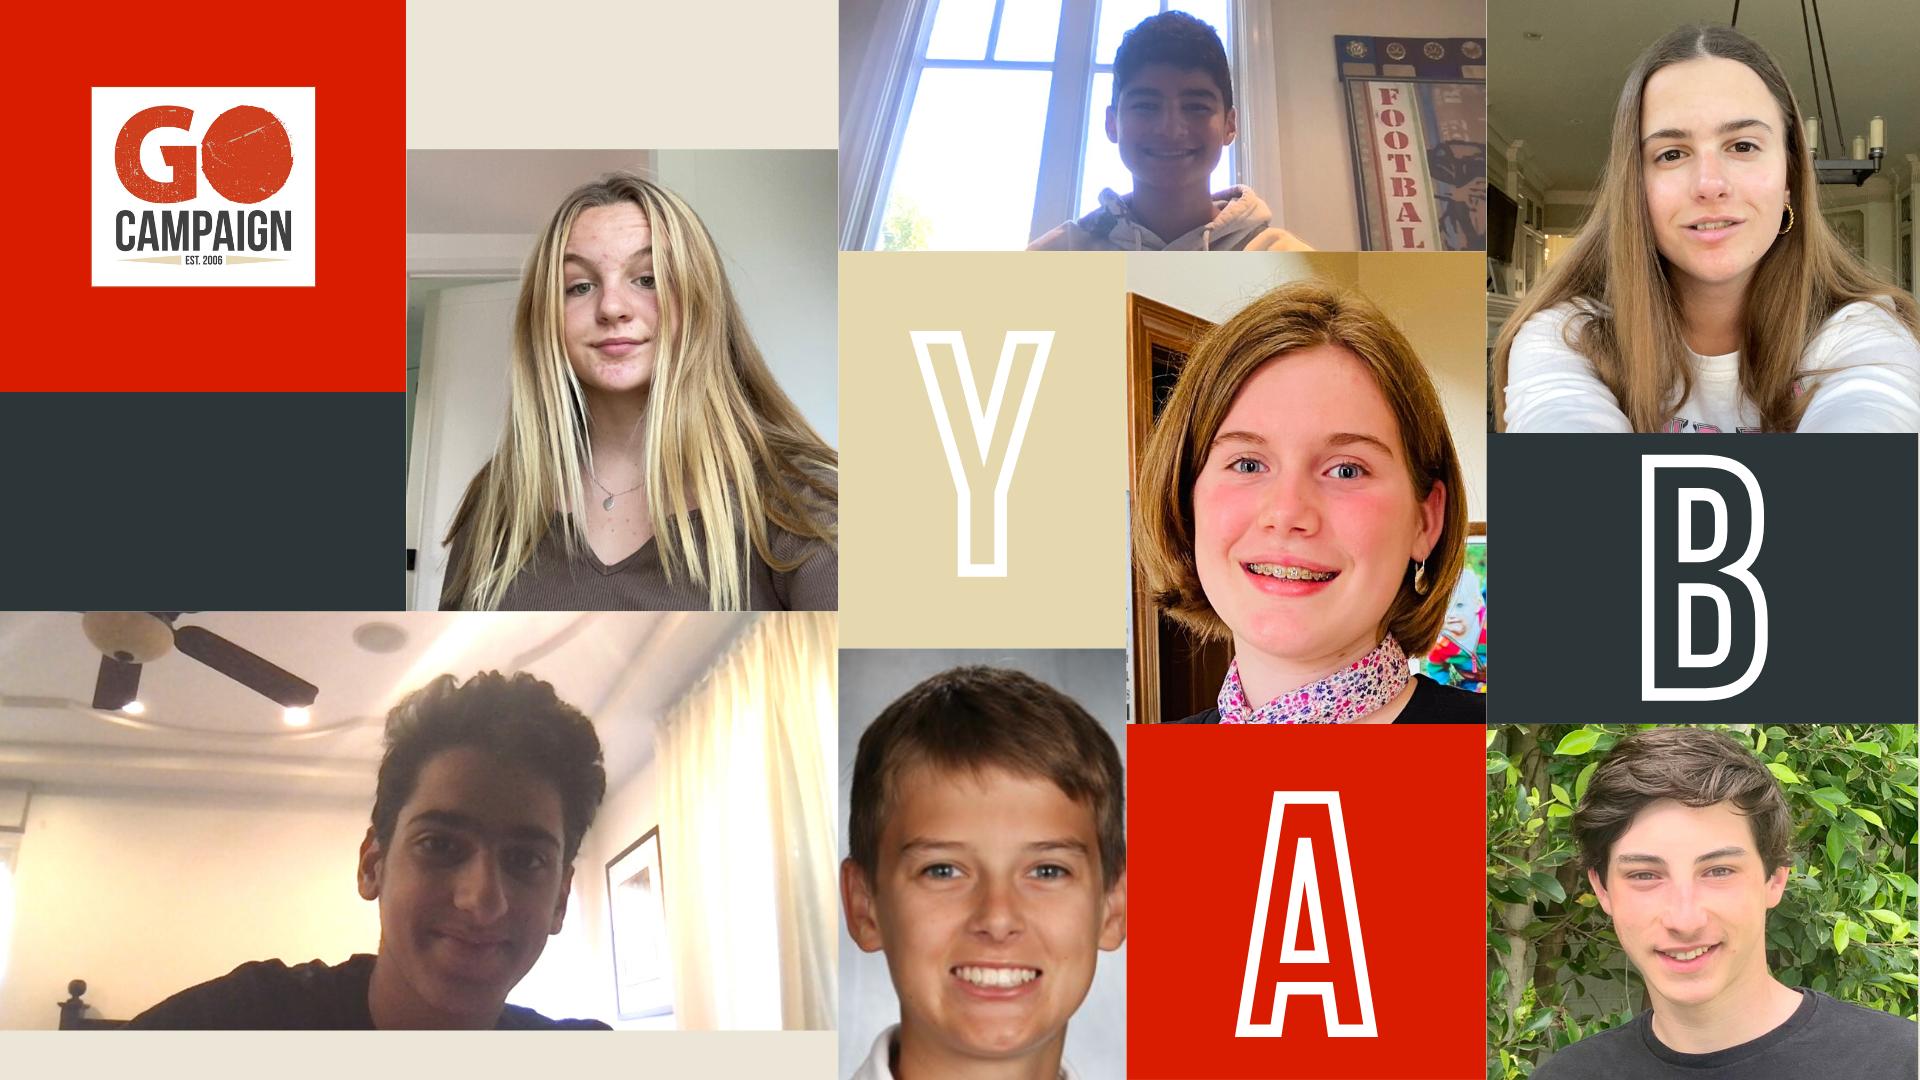 Meet the GO Campaign Youth Advisory Board